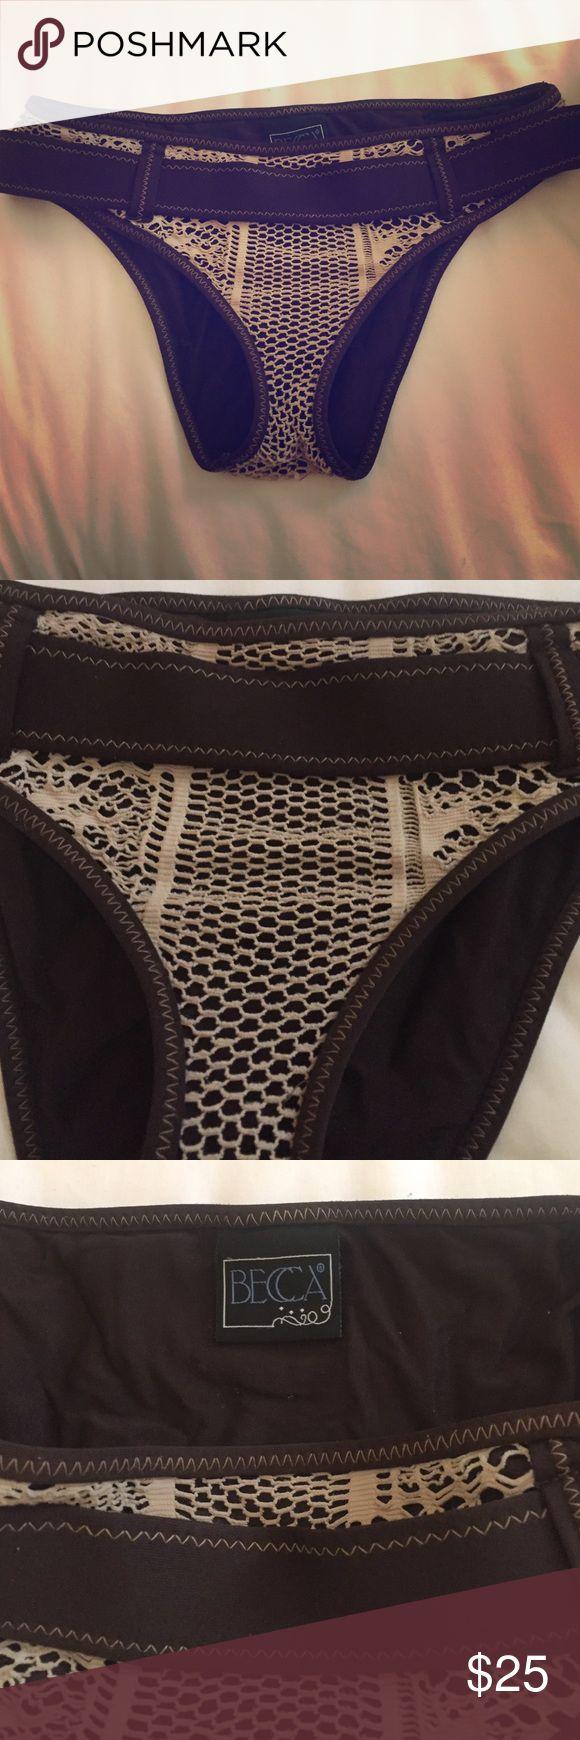 Bikini Bottom Becca Becca swim suite bikin bottom . Brown with beige netting ! Awesome fit barely worn. High end quality brand Becca Swim Swim Bikinis